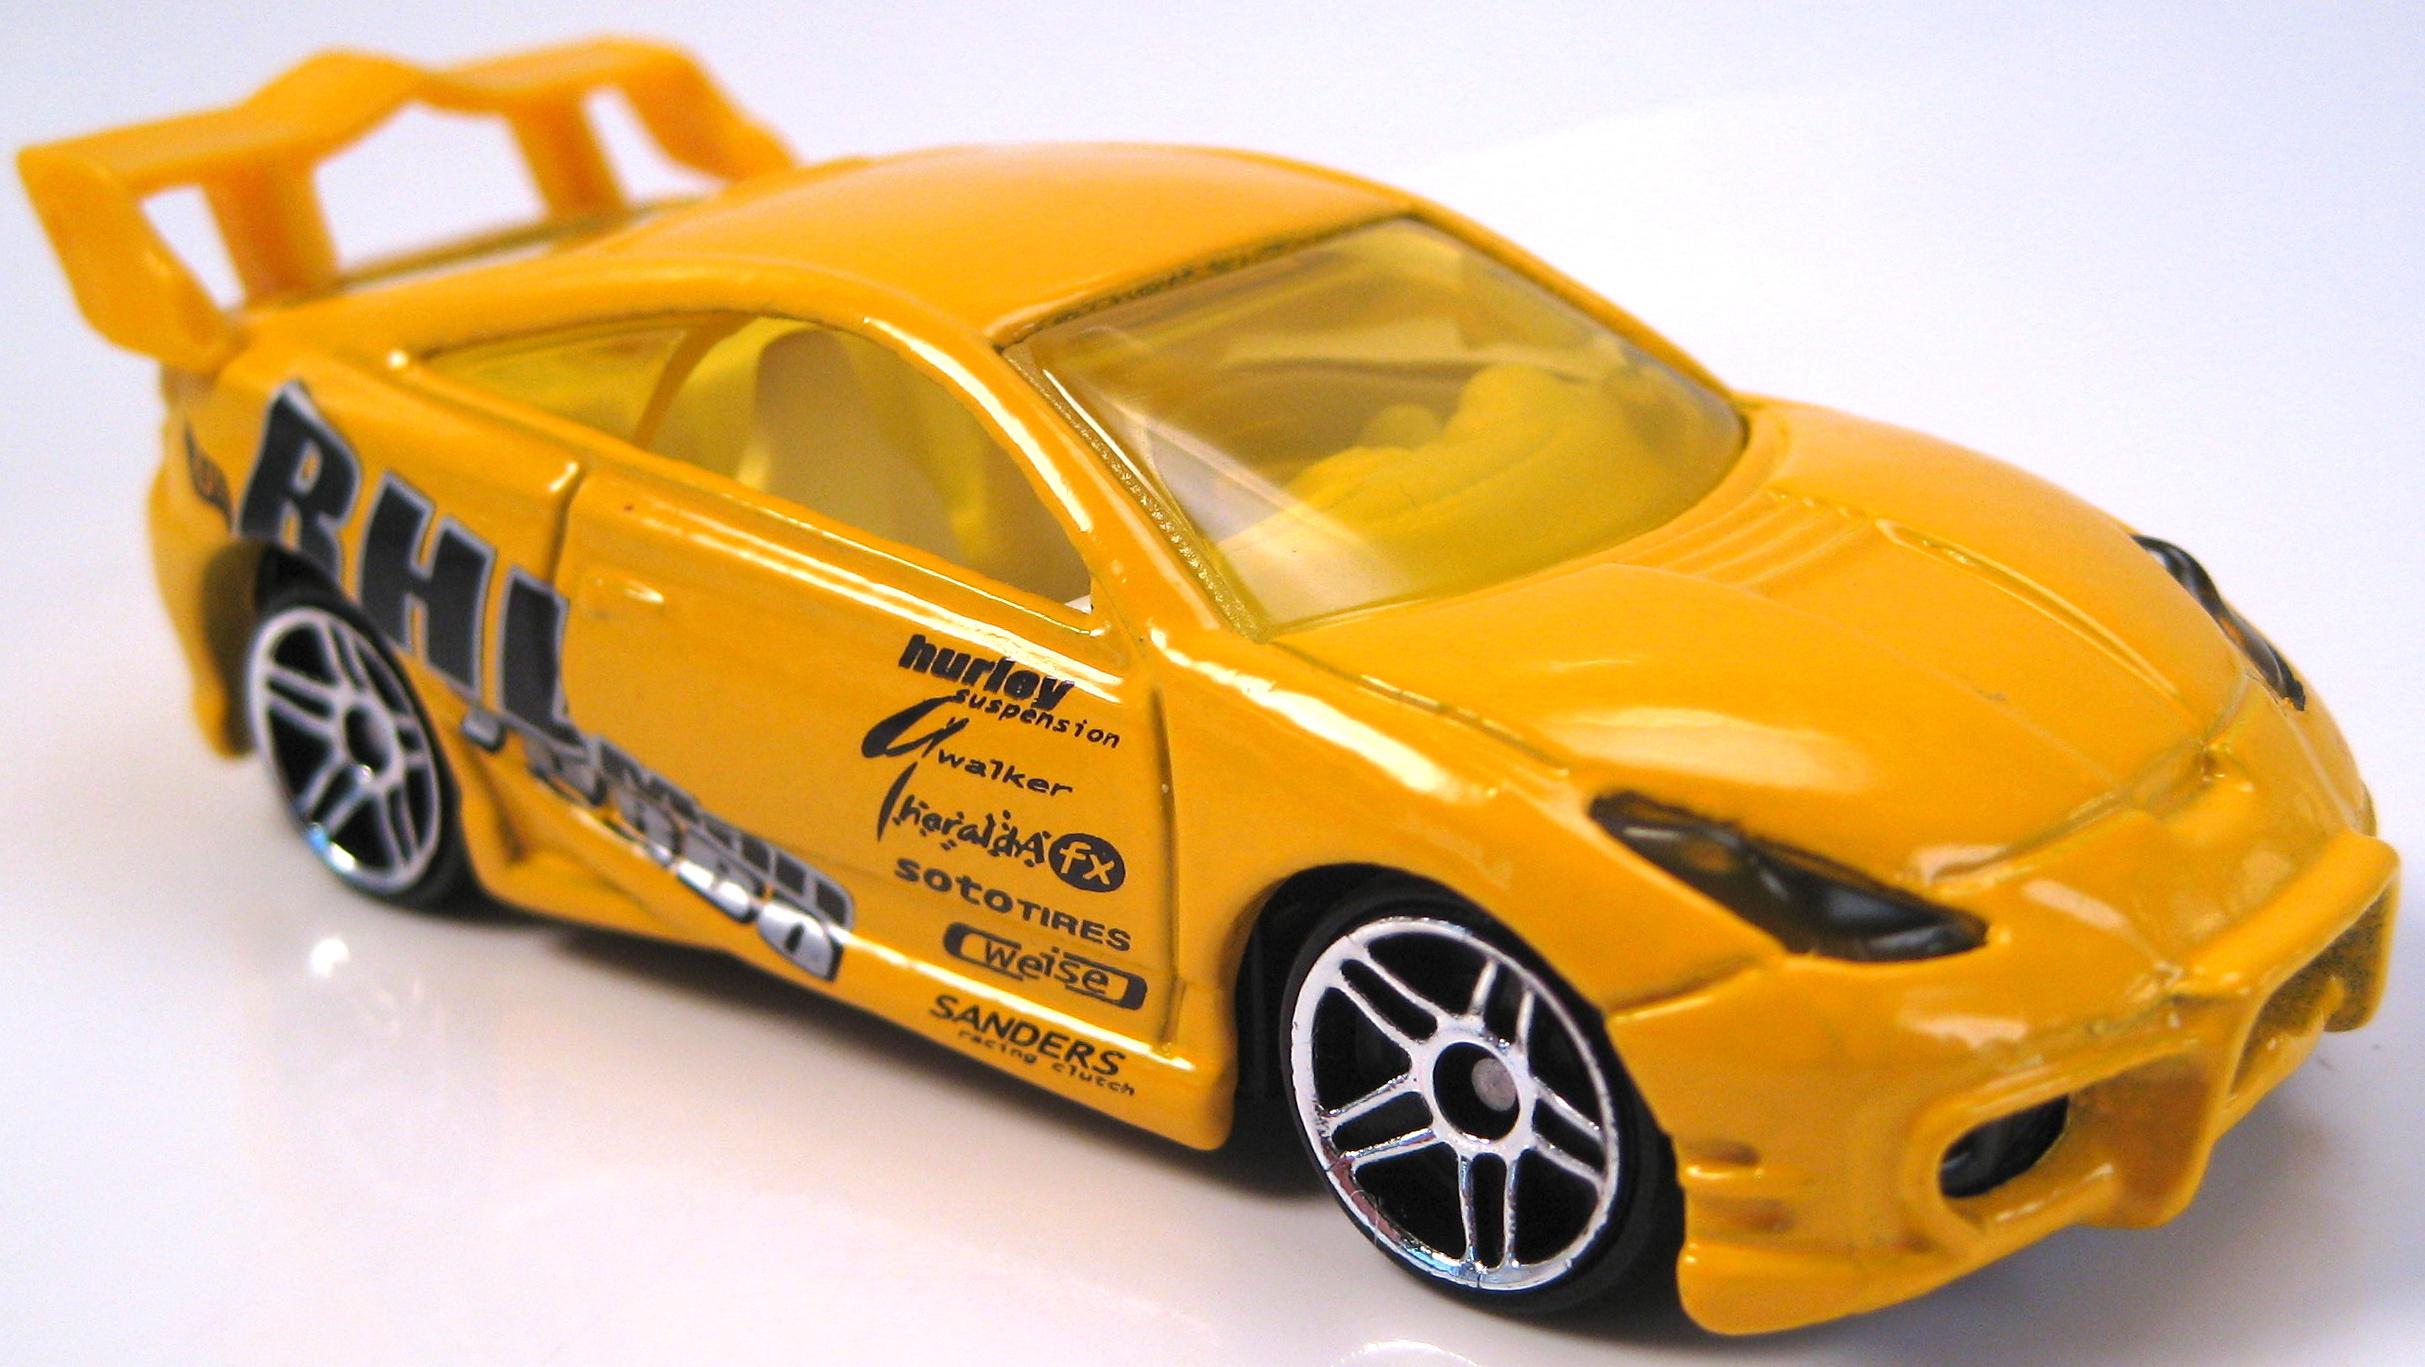 current 2356 february 13 2012 - Rare Hot Wheels Cars 2012